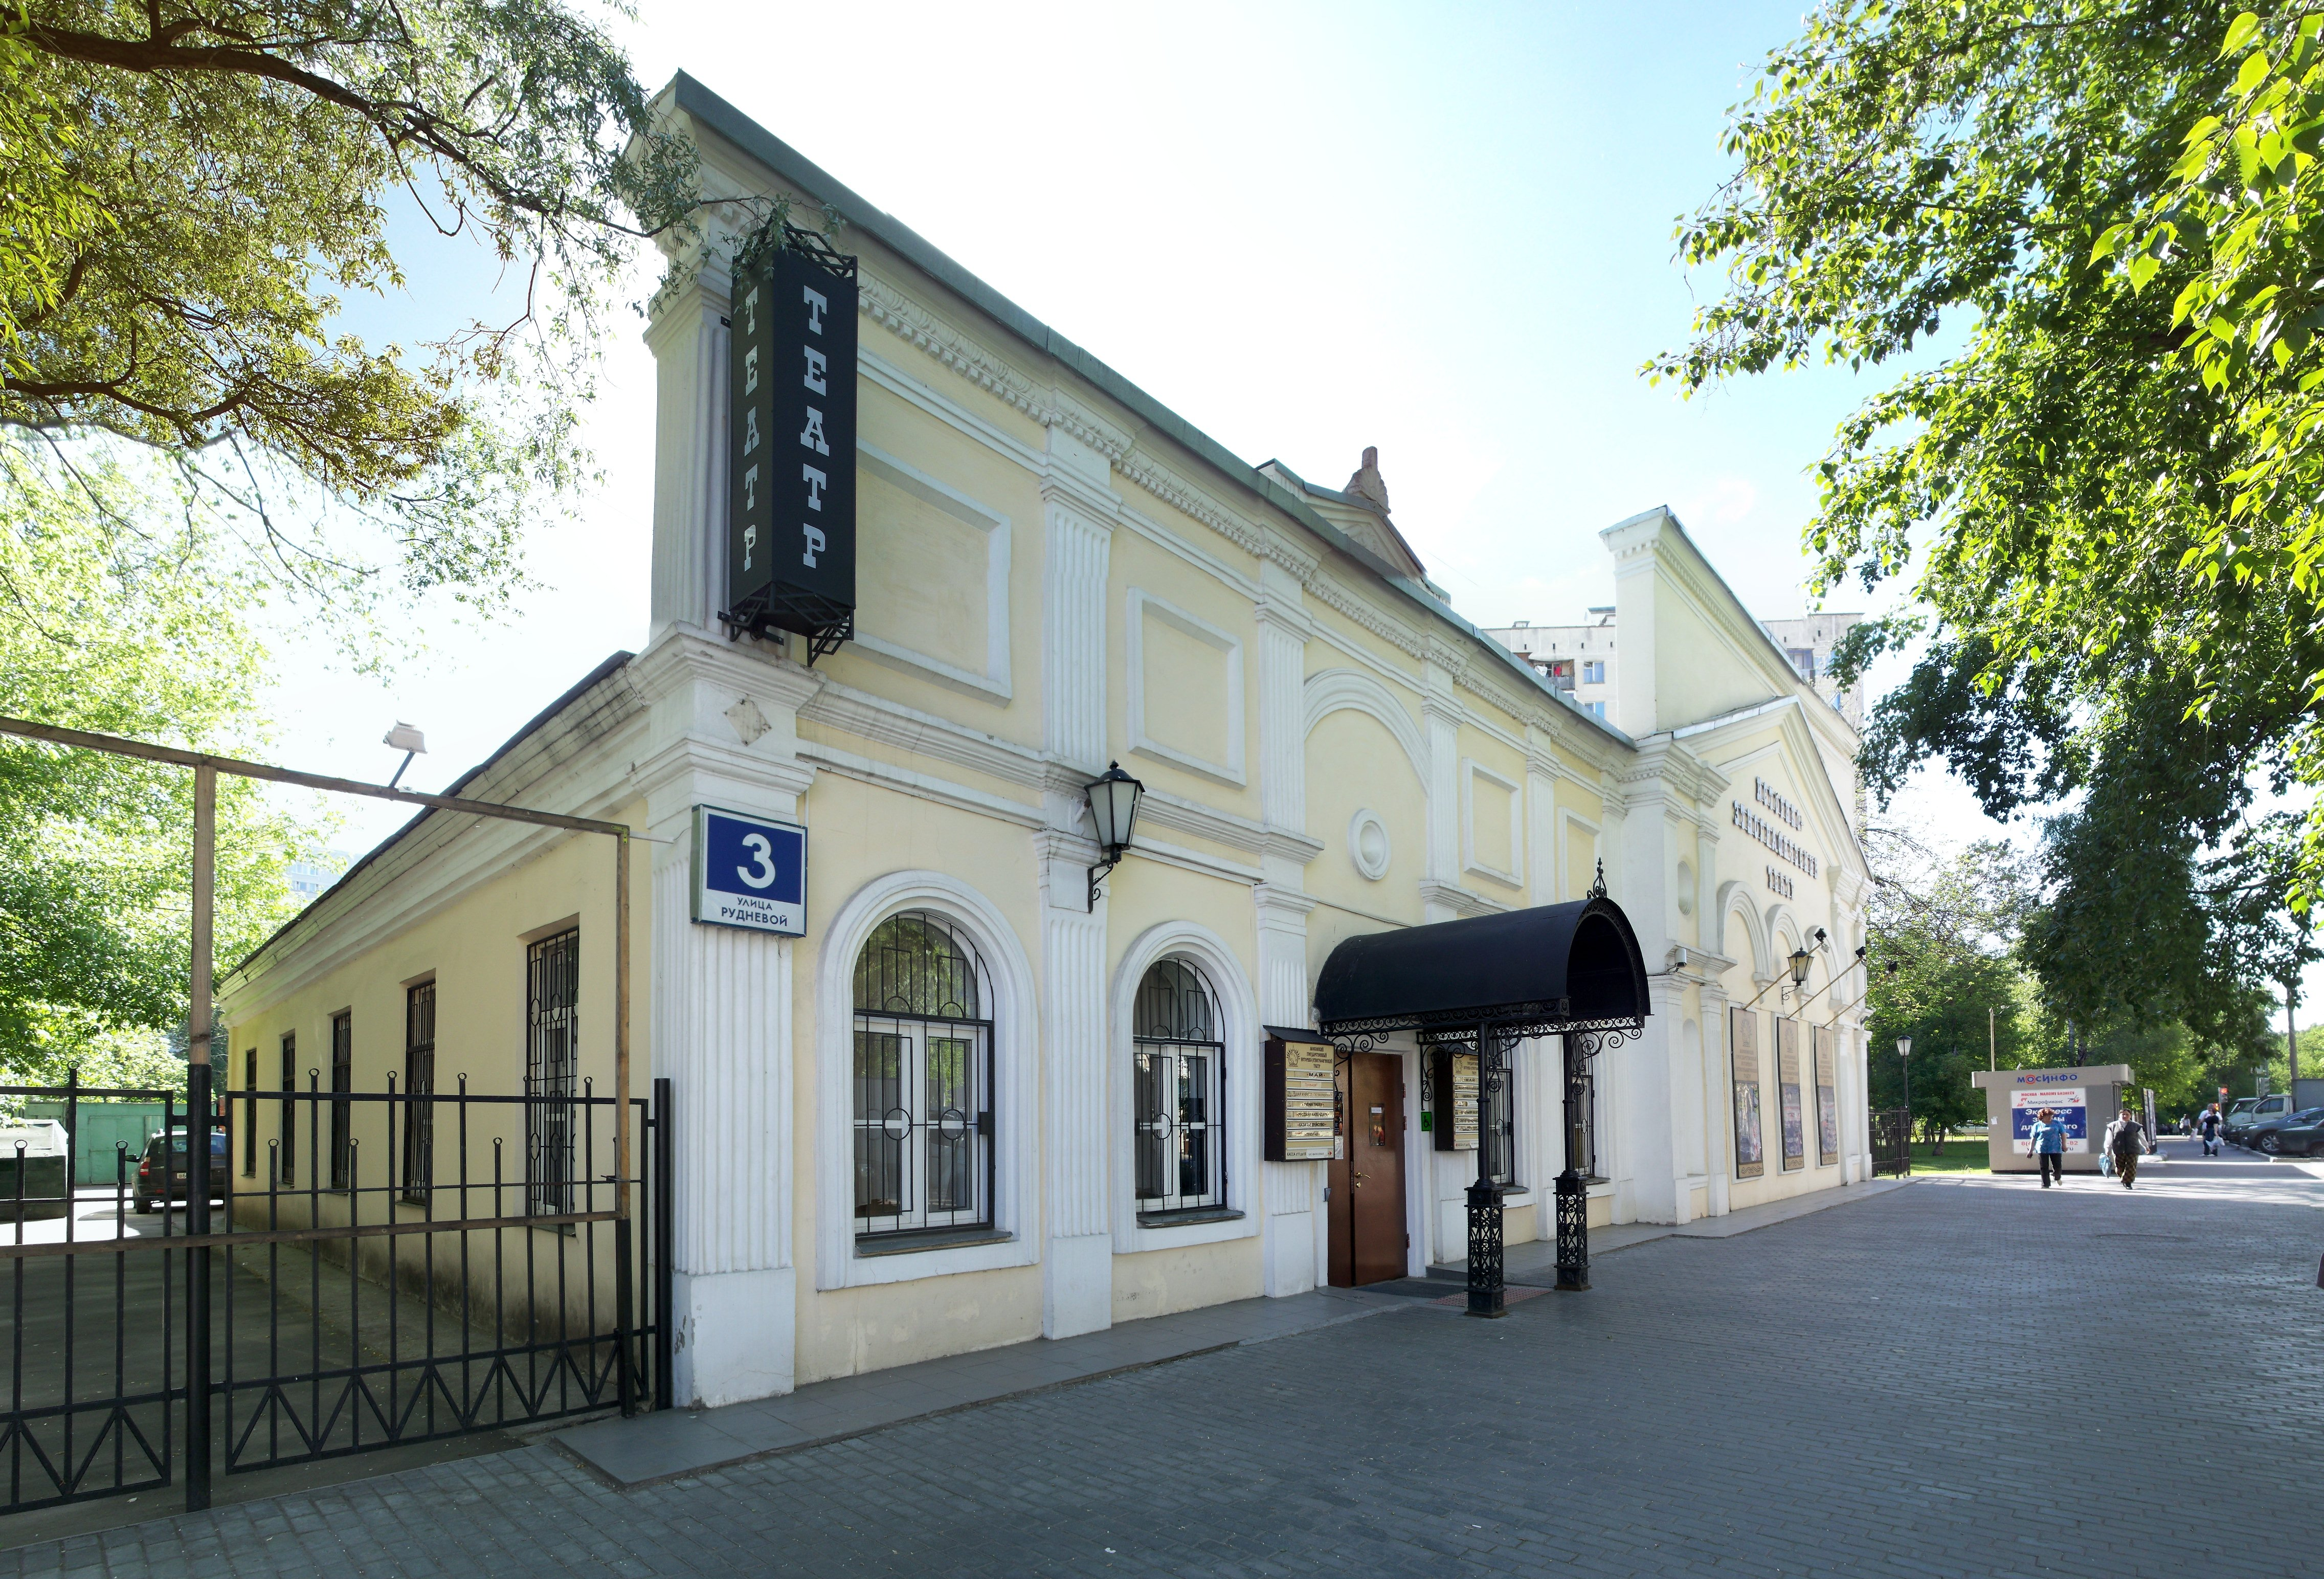 Этнографический театр москва афиша жлобин афиша кино родина